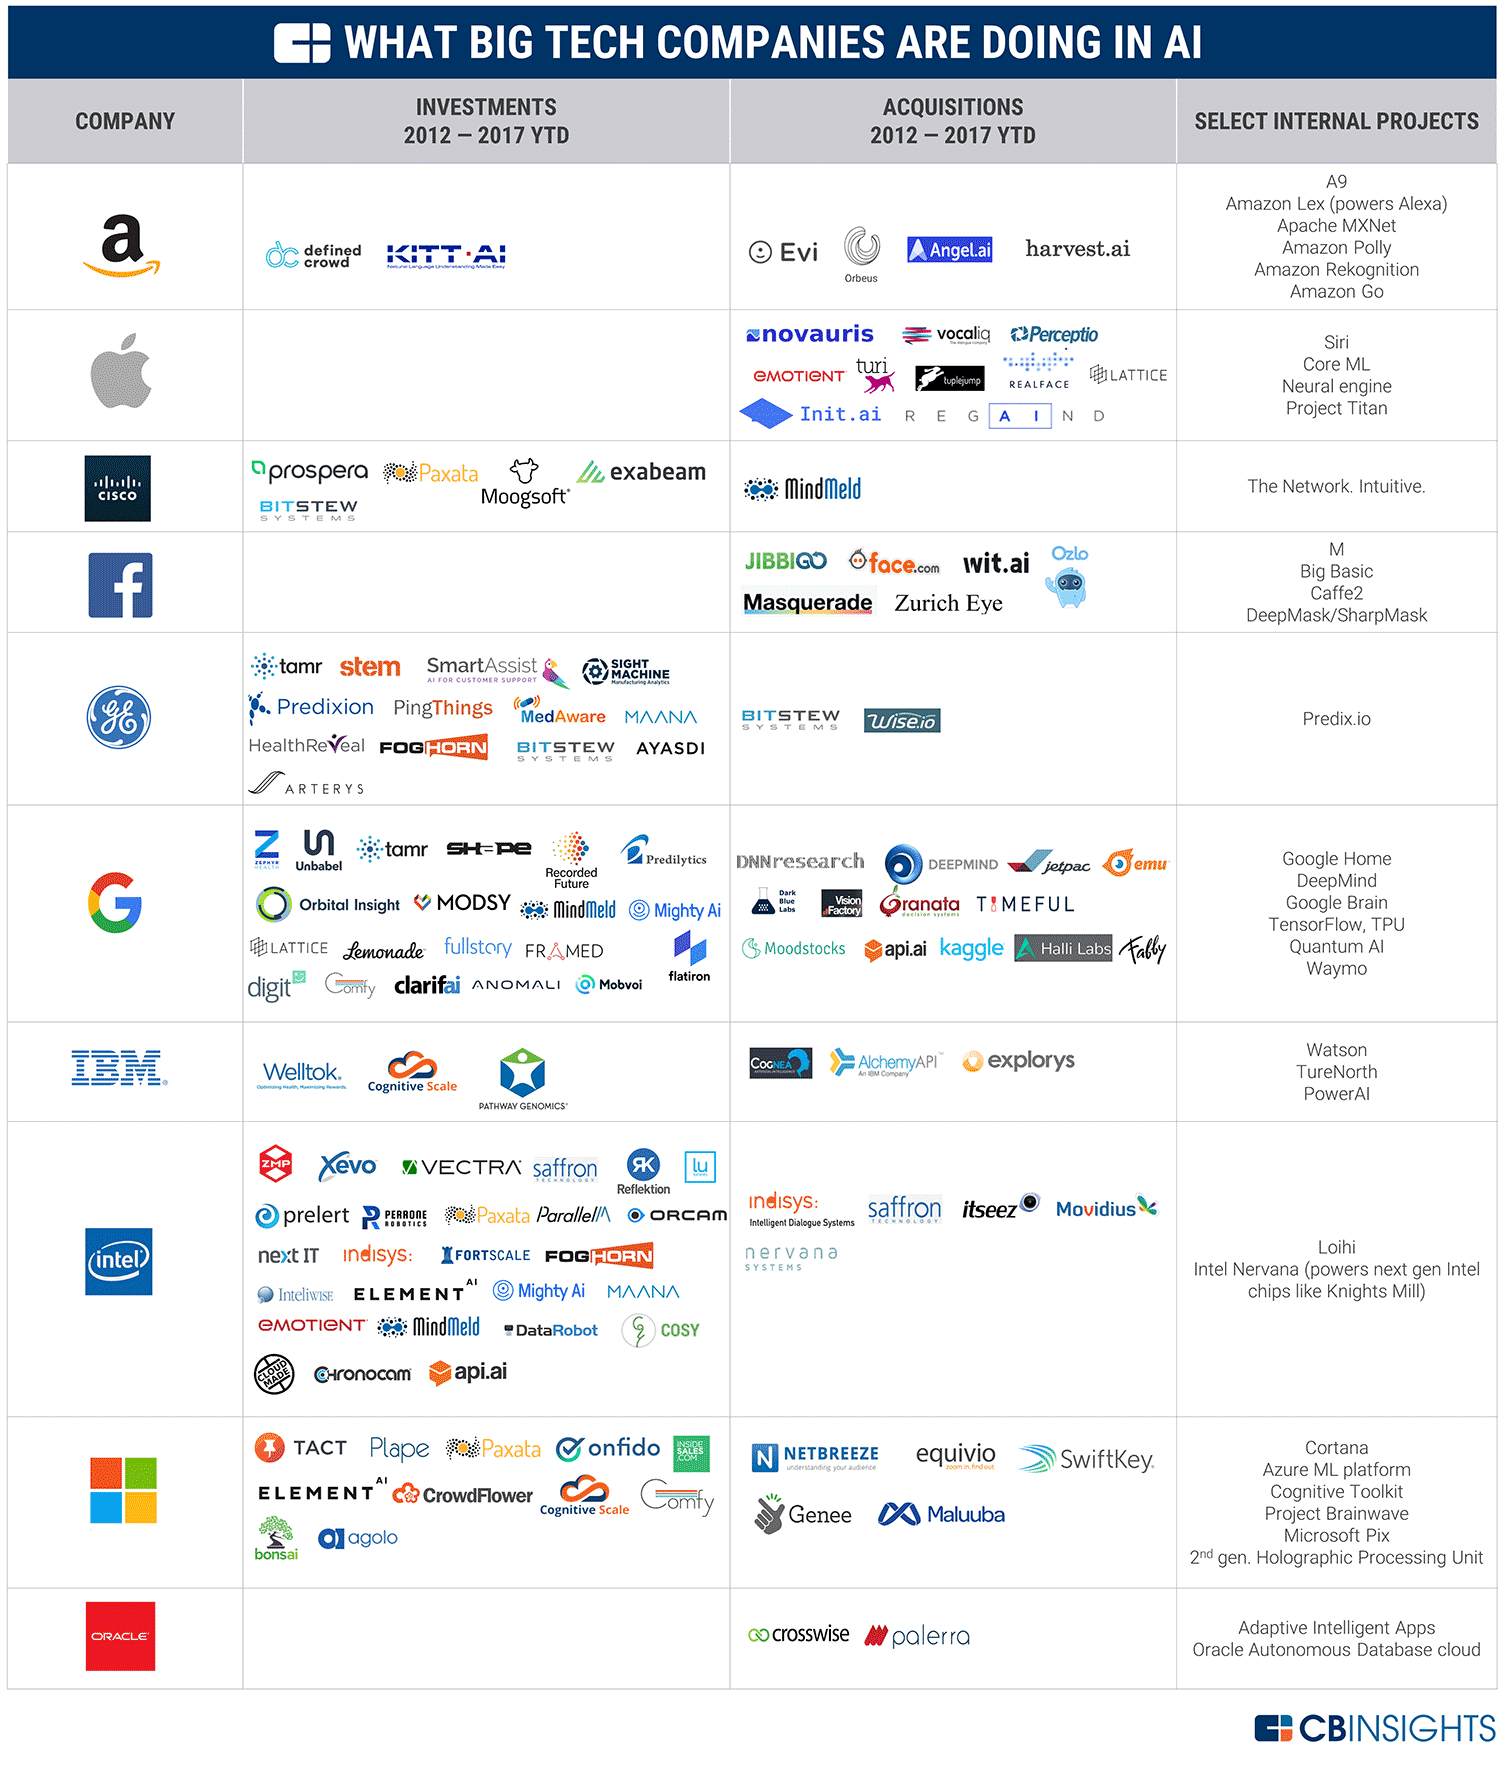 Top 10 AI Companies